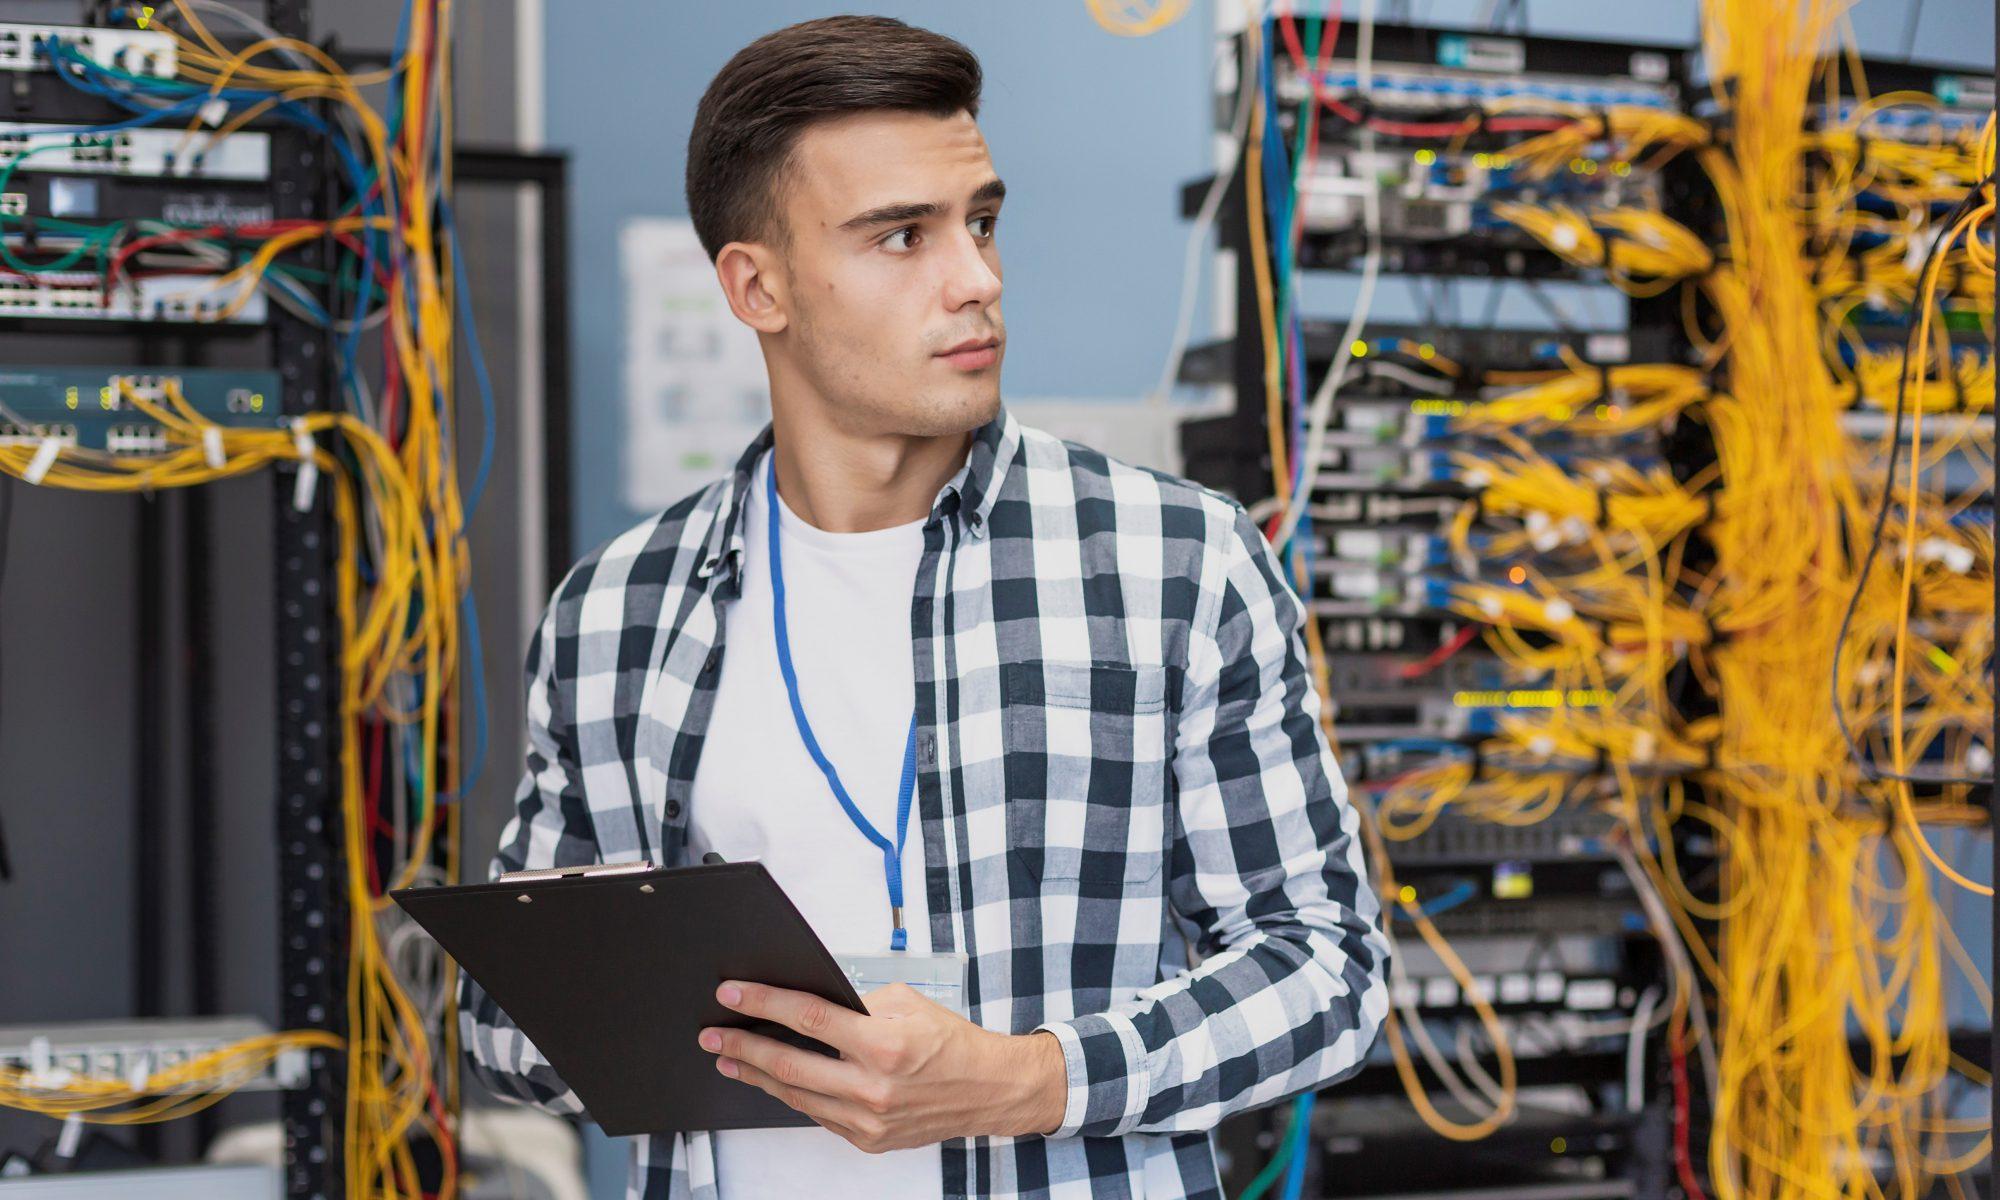 Ingeniería técnica en línea